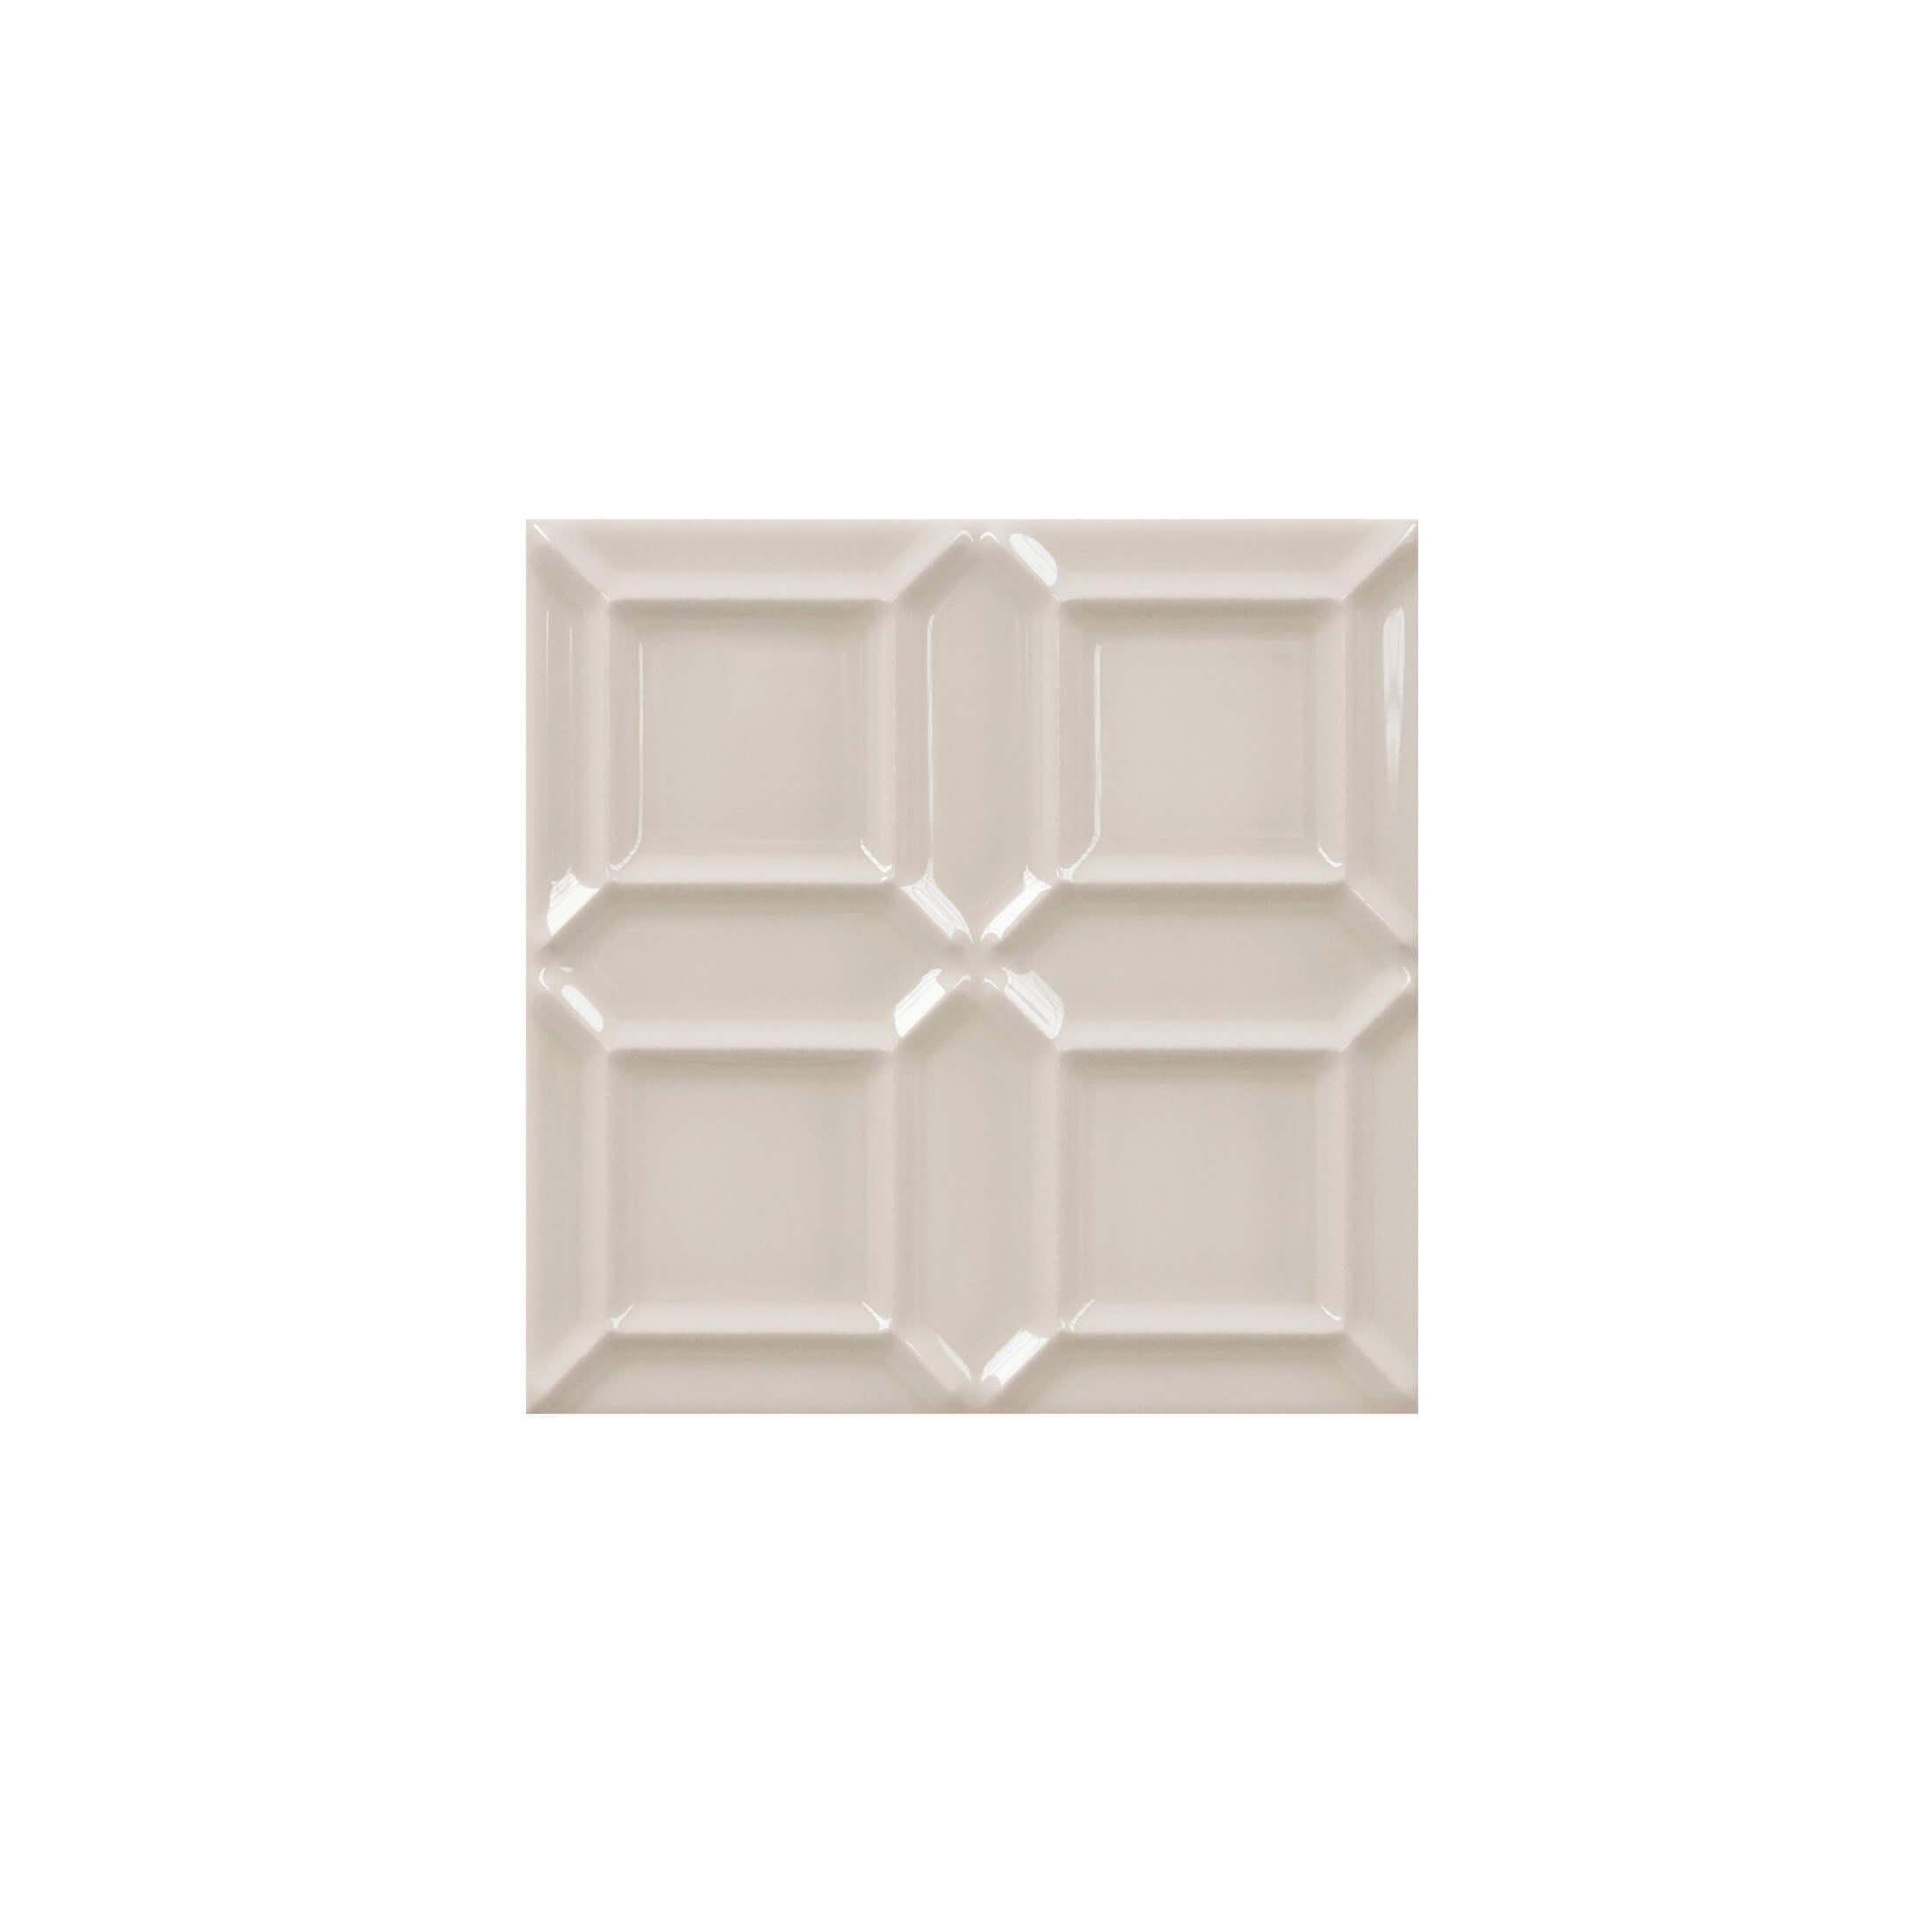 ADNE1111 - LISO EDGE - 15 cm X 15 cm